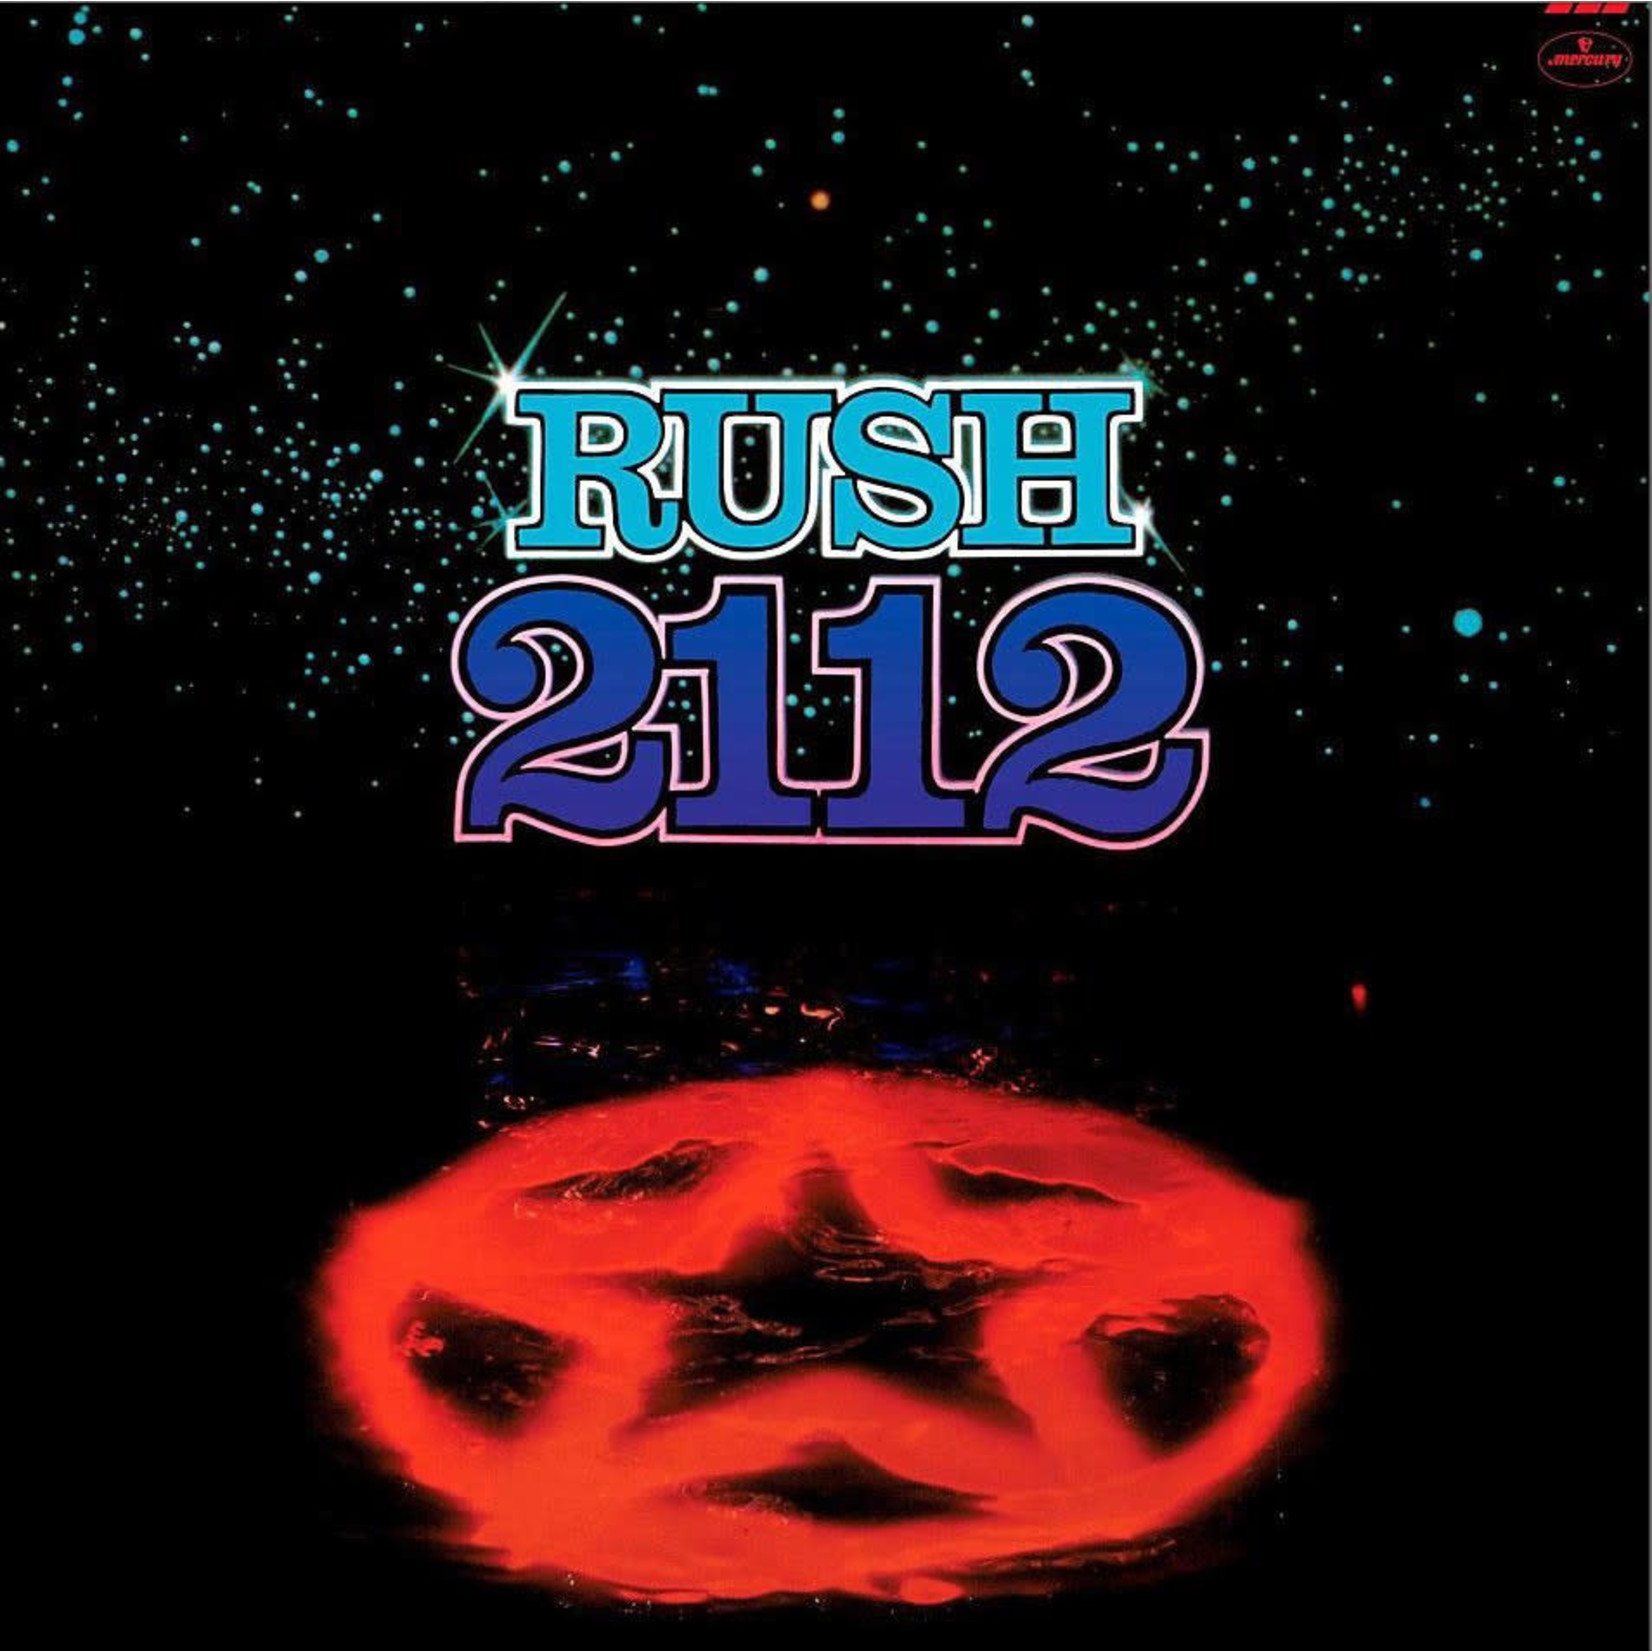 [Vintage] Rush: 2112 (Anthem Reissue)